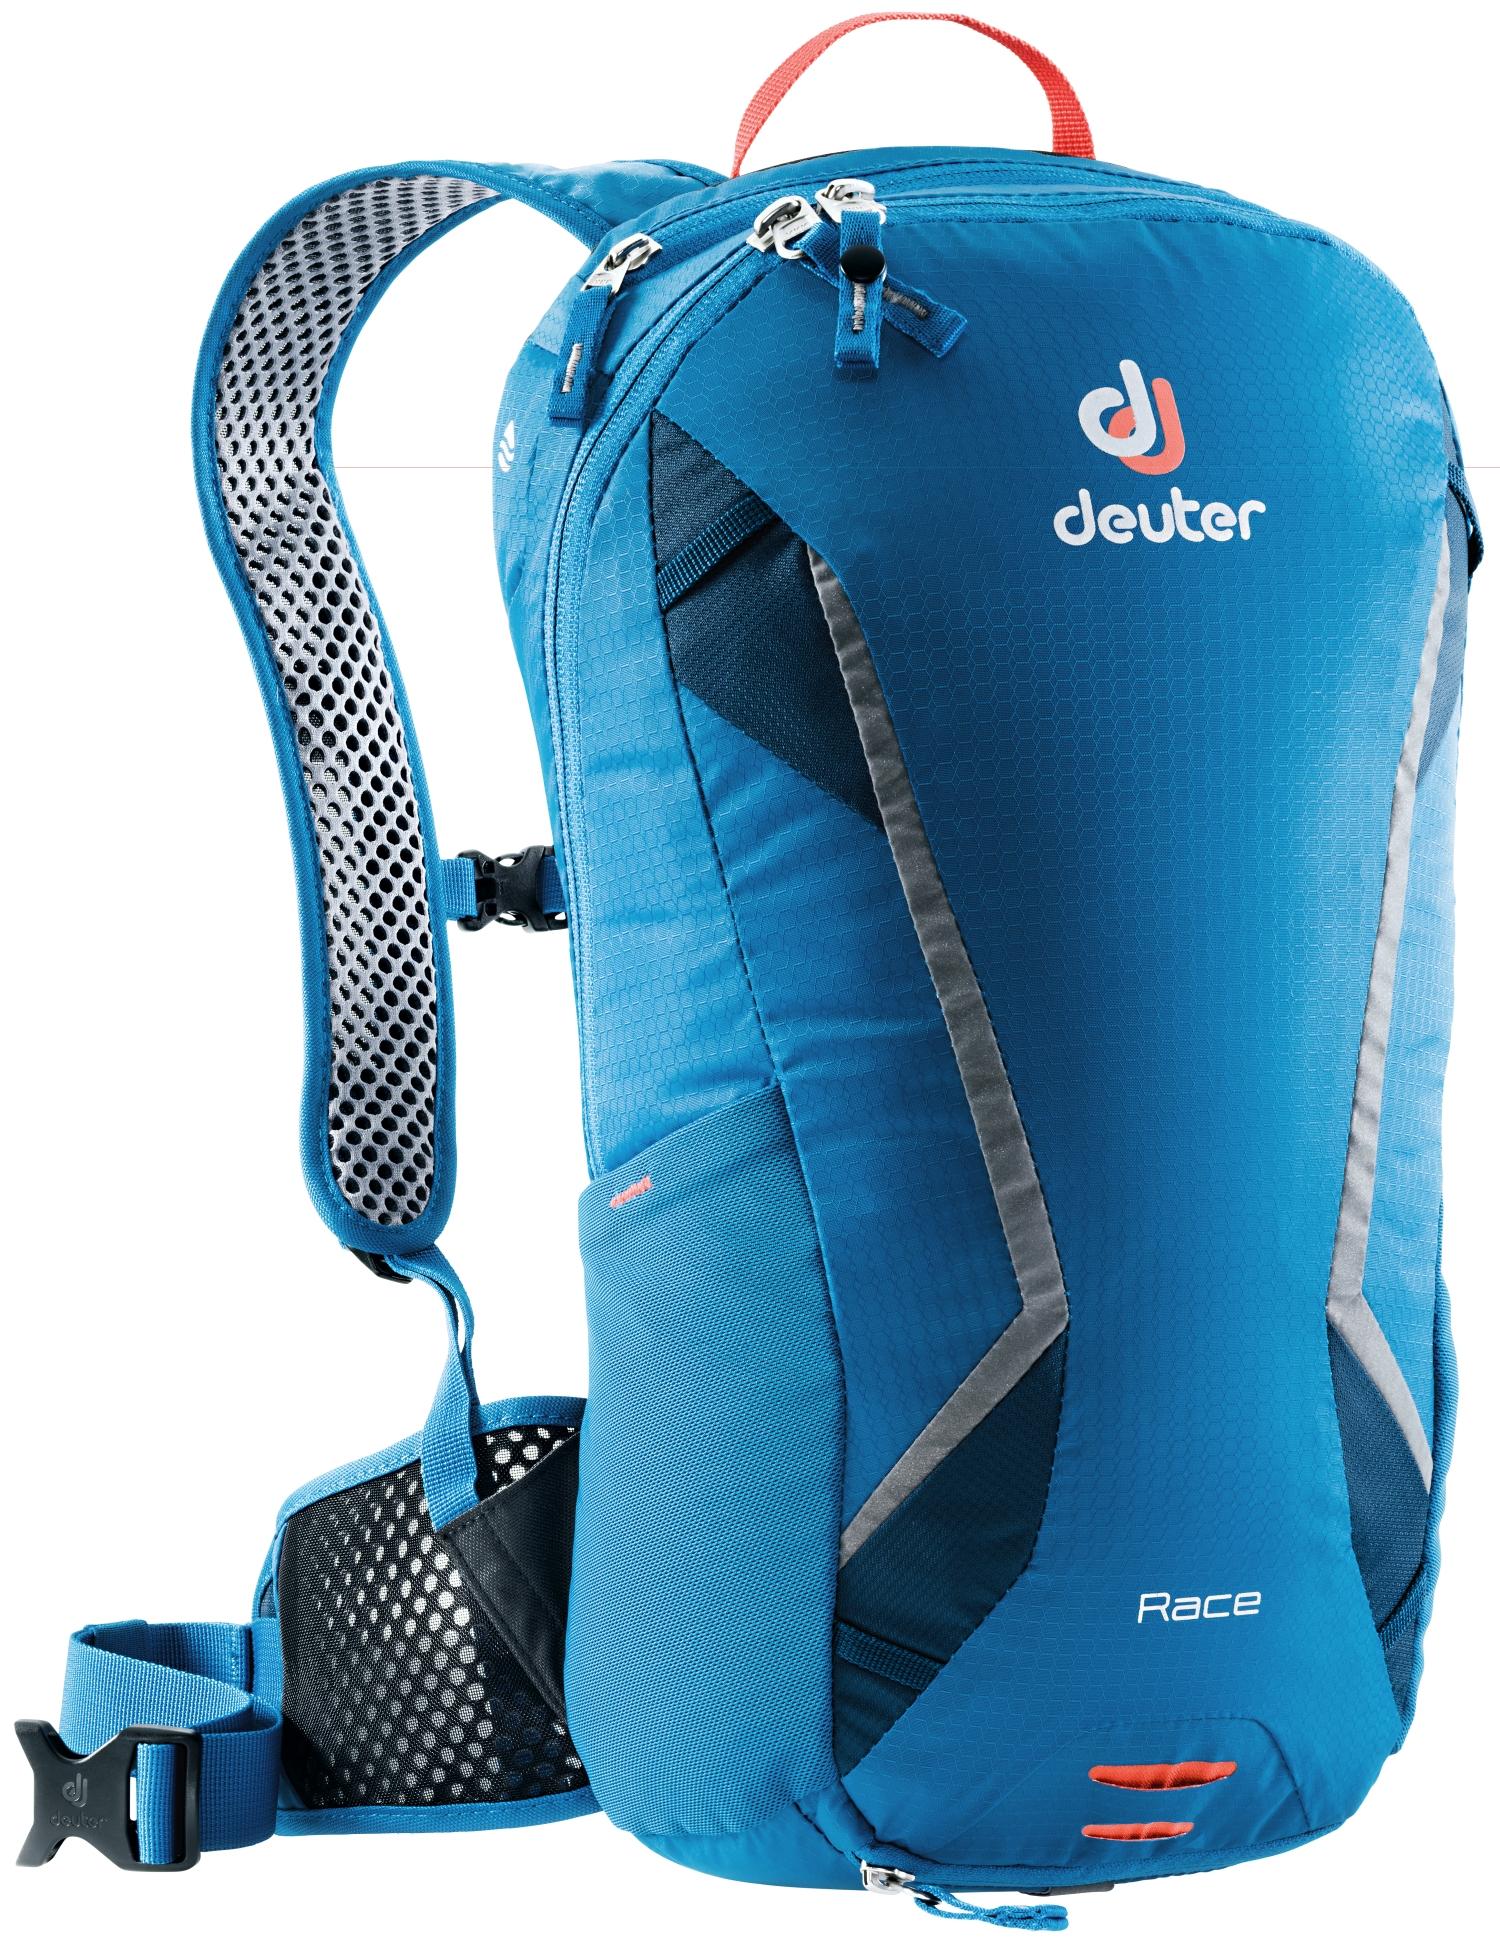 Deuter RACE, kolesarski nahrbtnik, modra